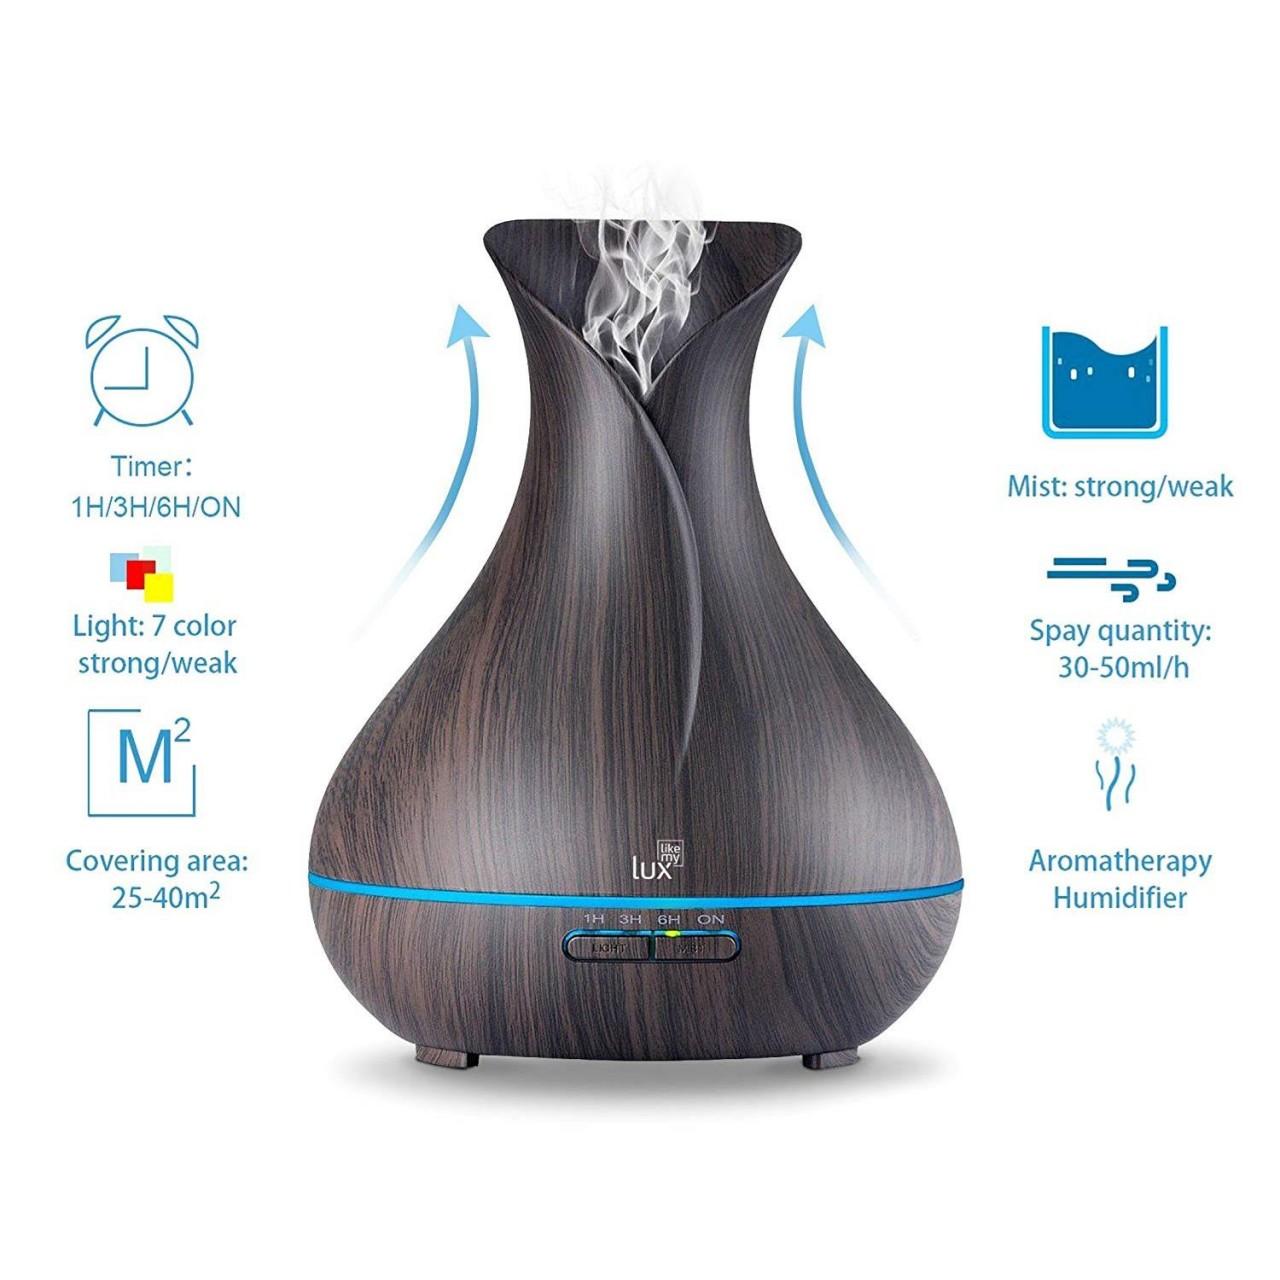 Aroma Diffuser Likemylux 400ml Luftbefeuchter Ultraschall Öl Diffusor LED schwarz